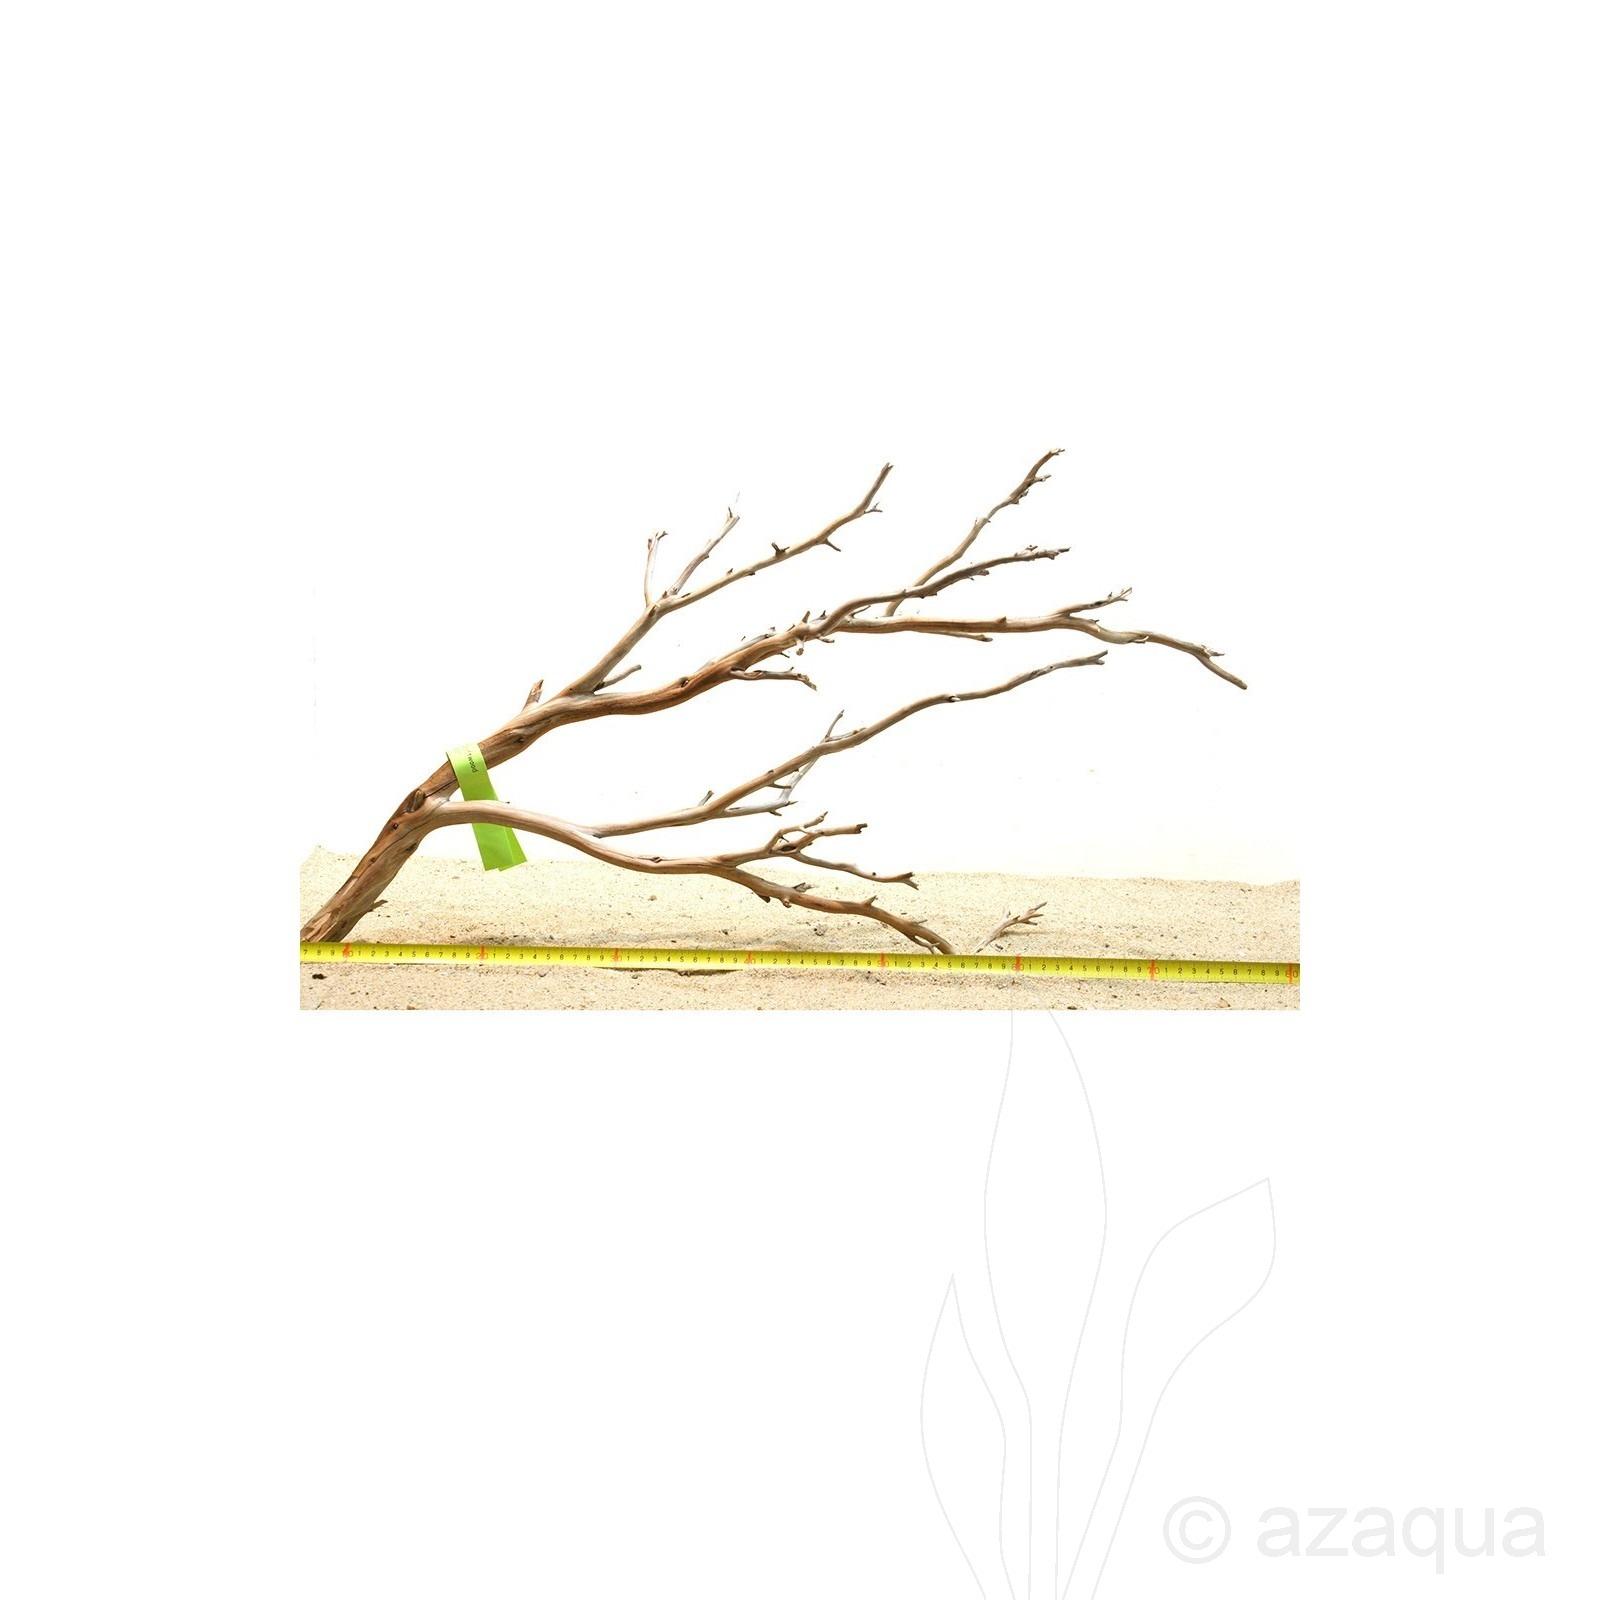 Manzanita hout XL (60-75cm) - Manzanita Wood voor het aquarium